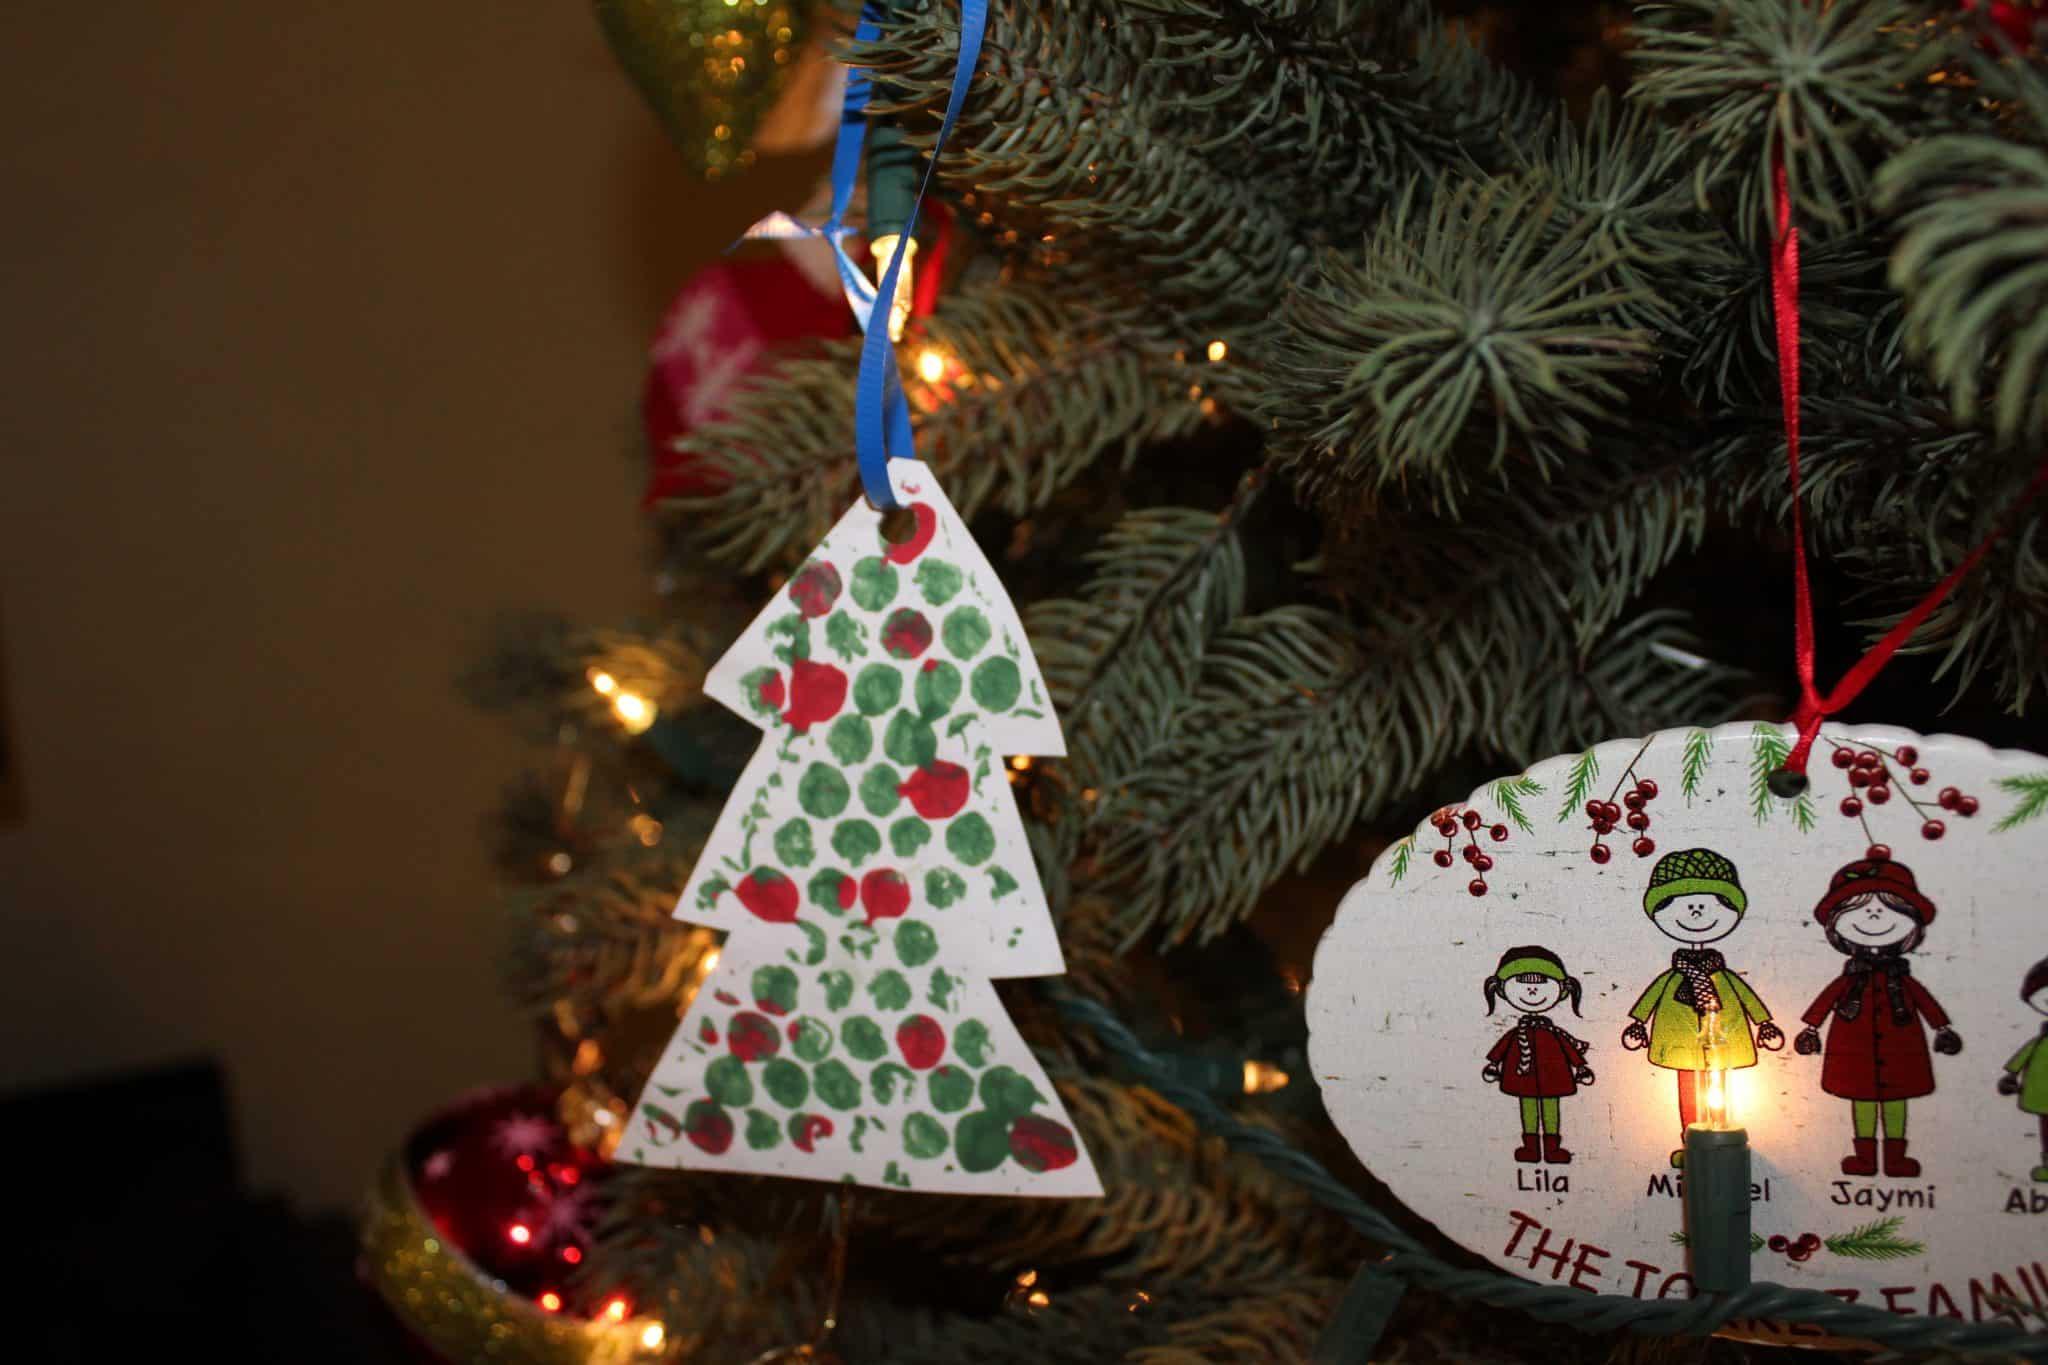 Christmas tree painted print used as an Christmas tree Ornament